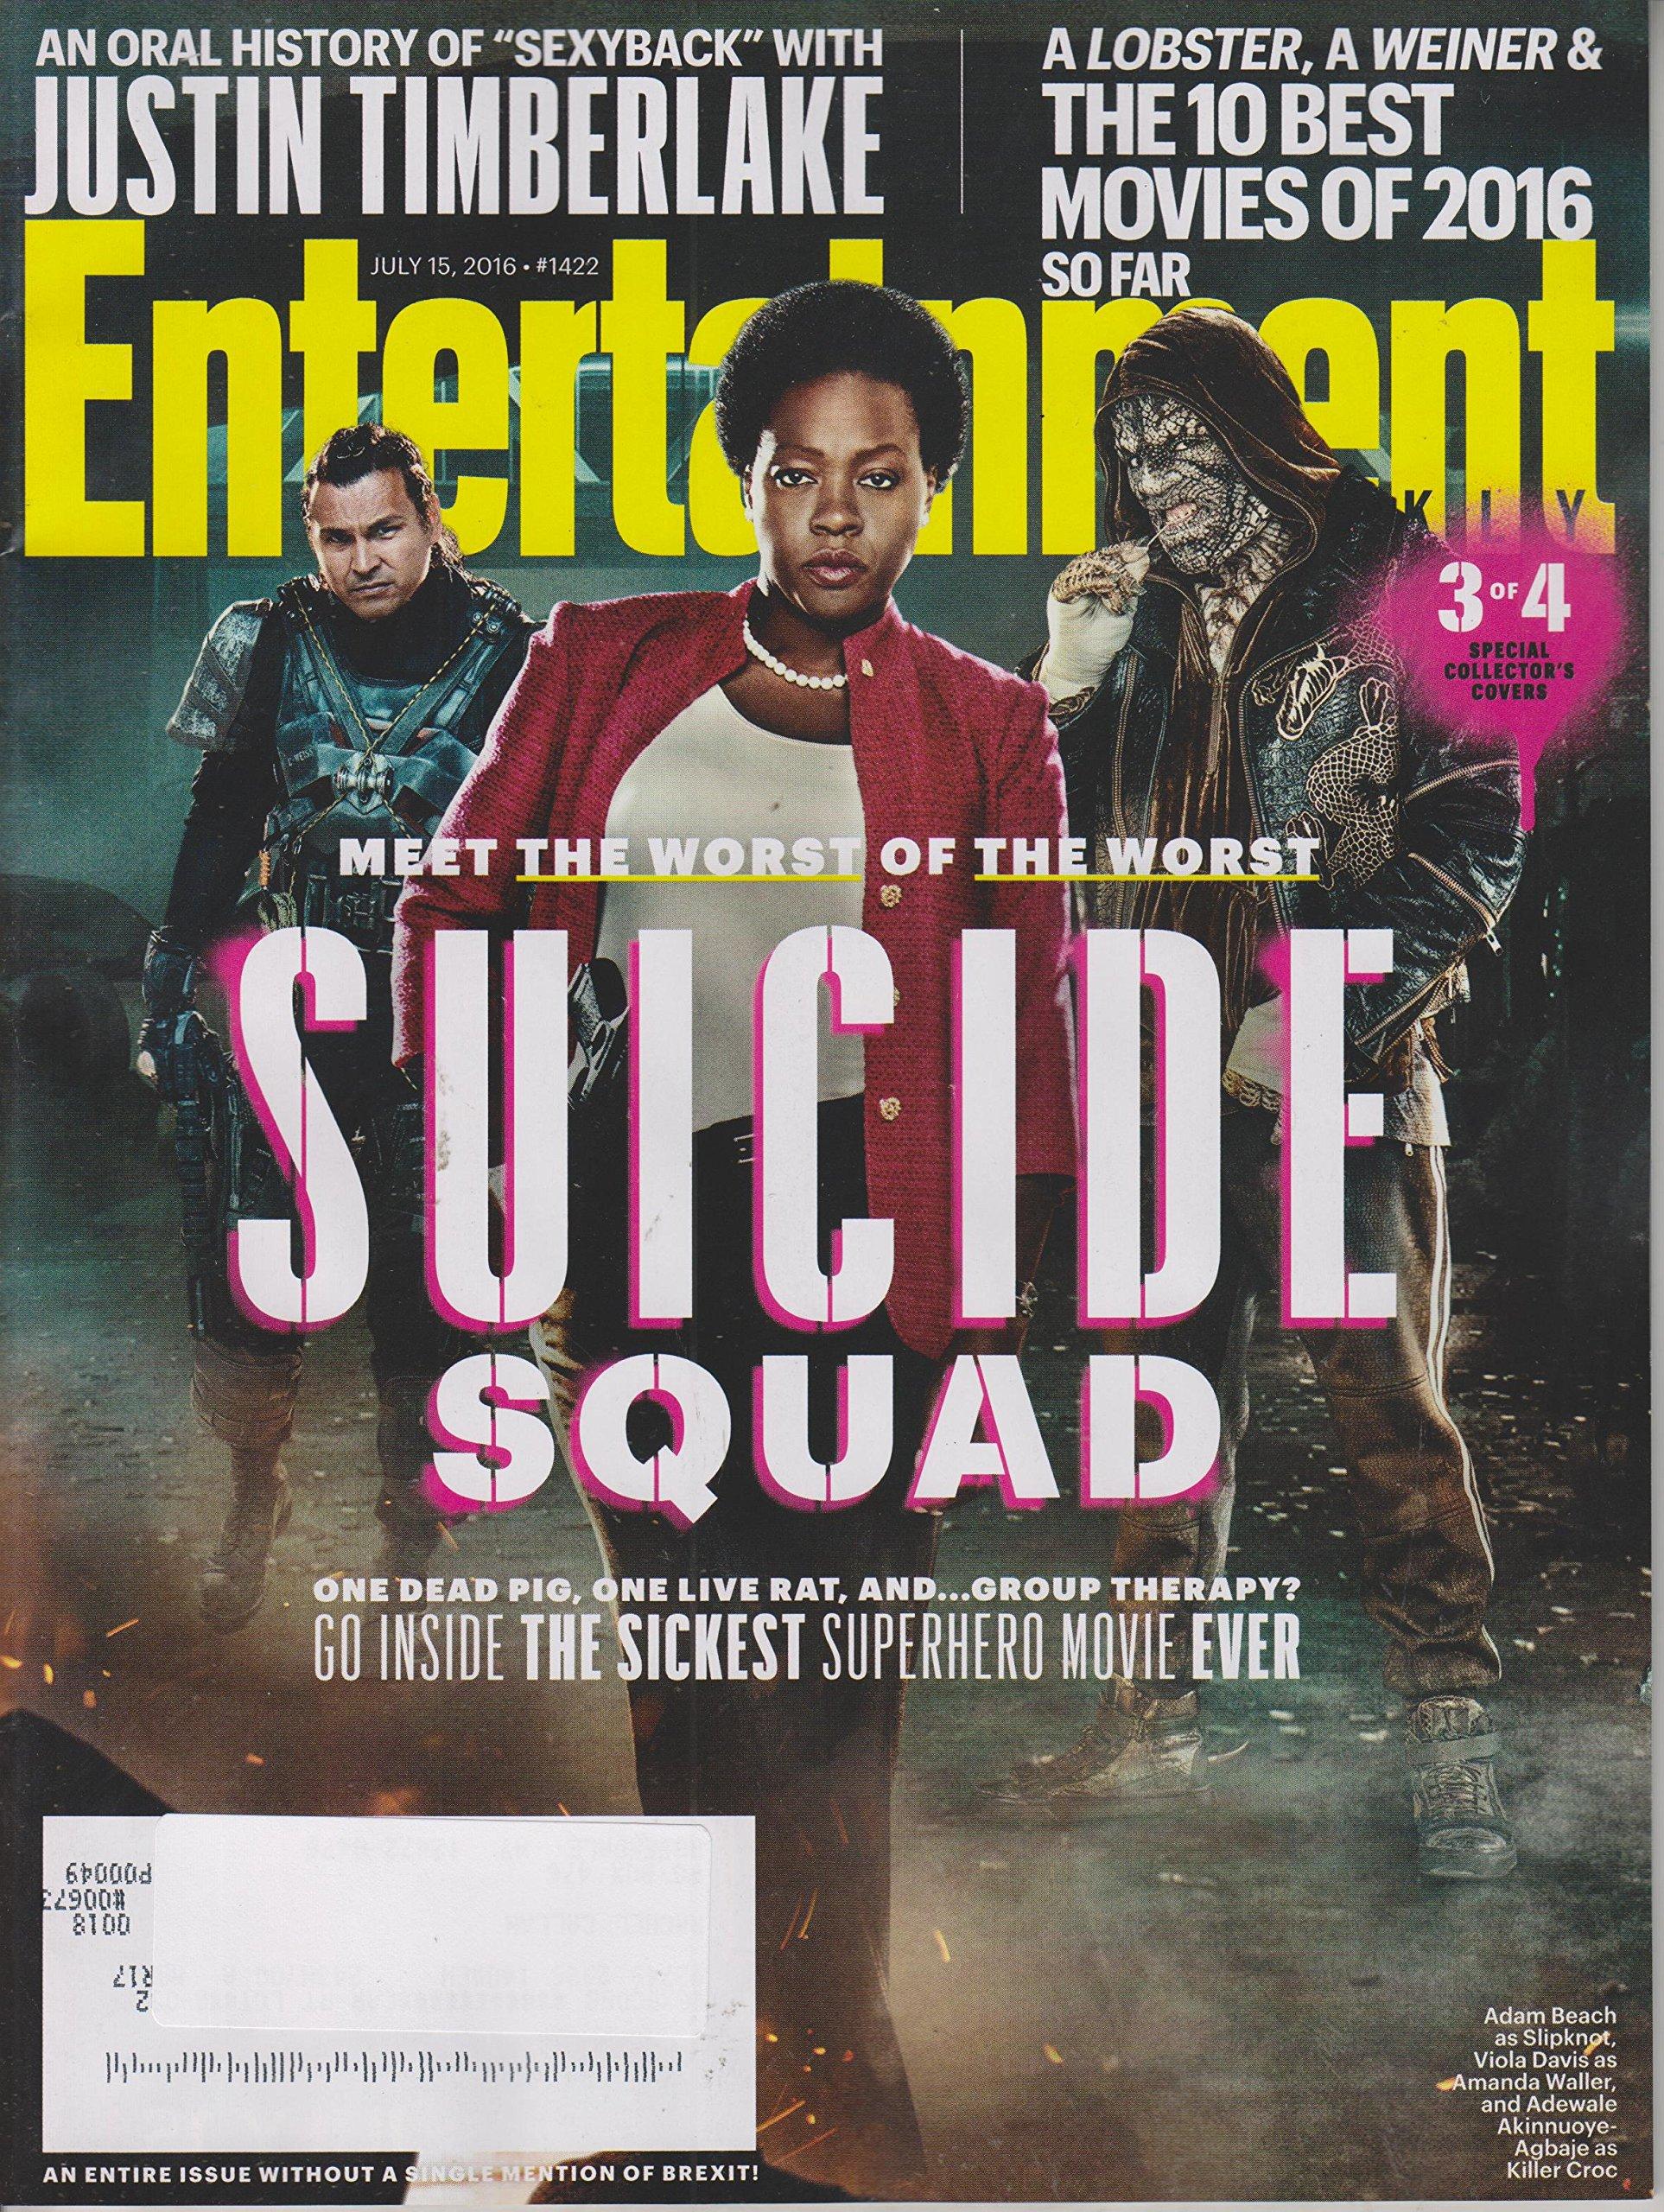 Entertainment Weekly July 15, 2016 Suicide Squad Cover 3 (Adam Beach, Viola Davis, Adewale Akinnuoye-Agbaje) PDF